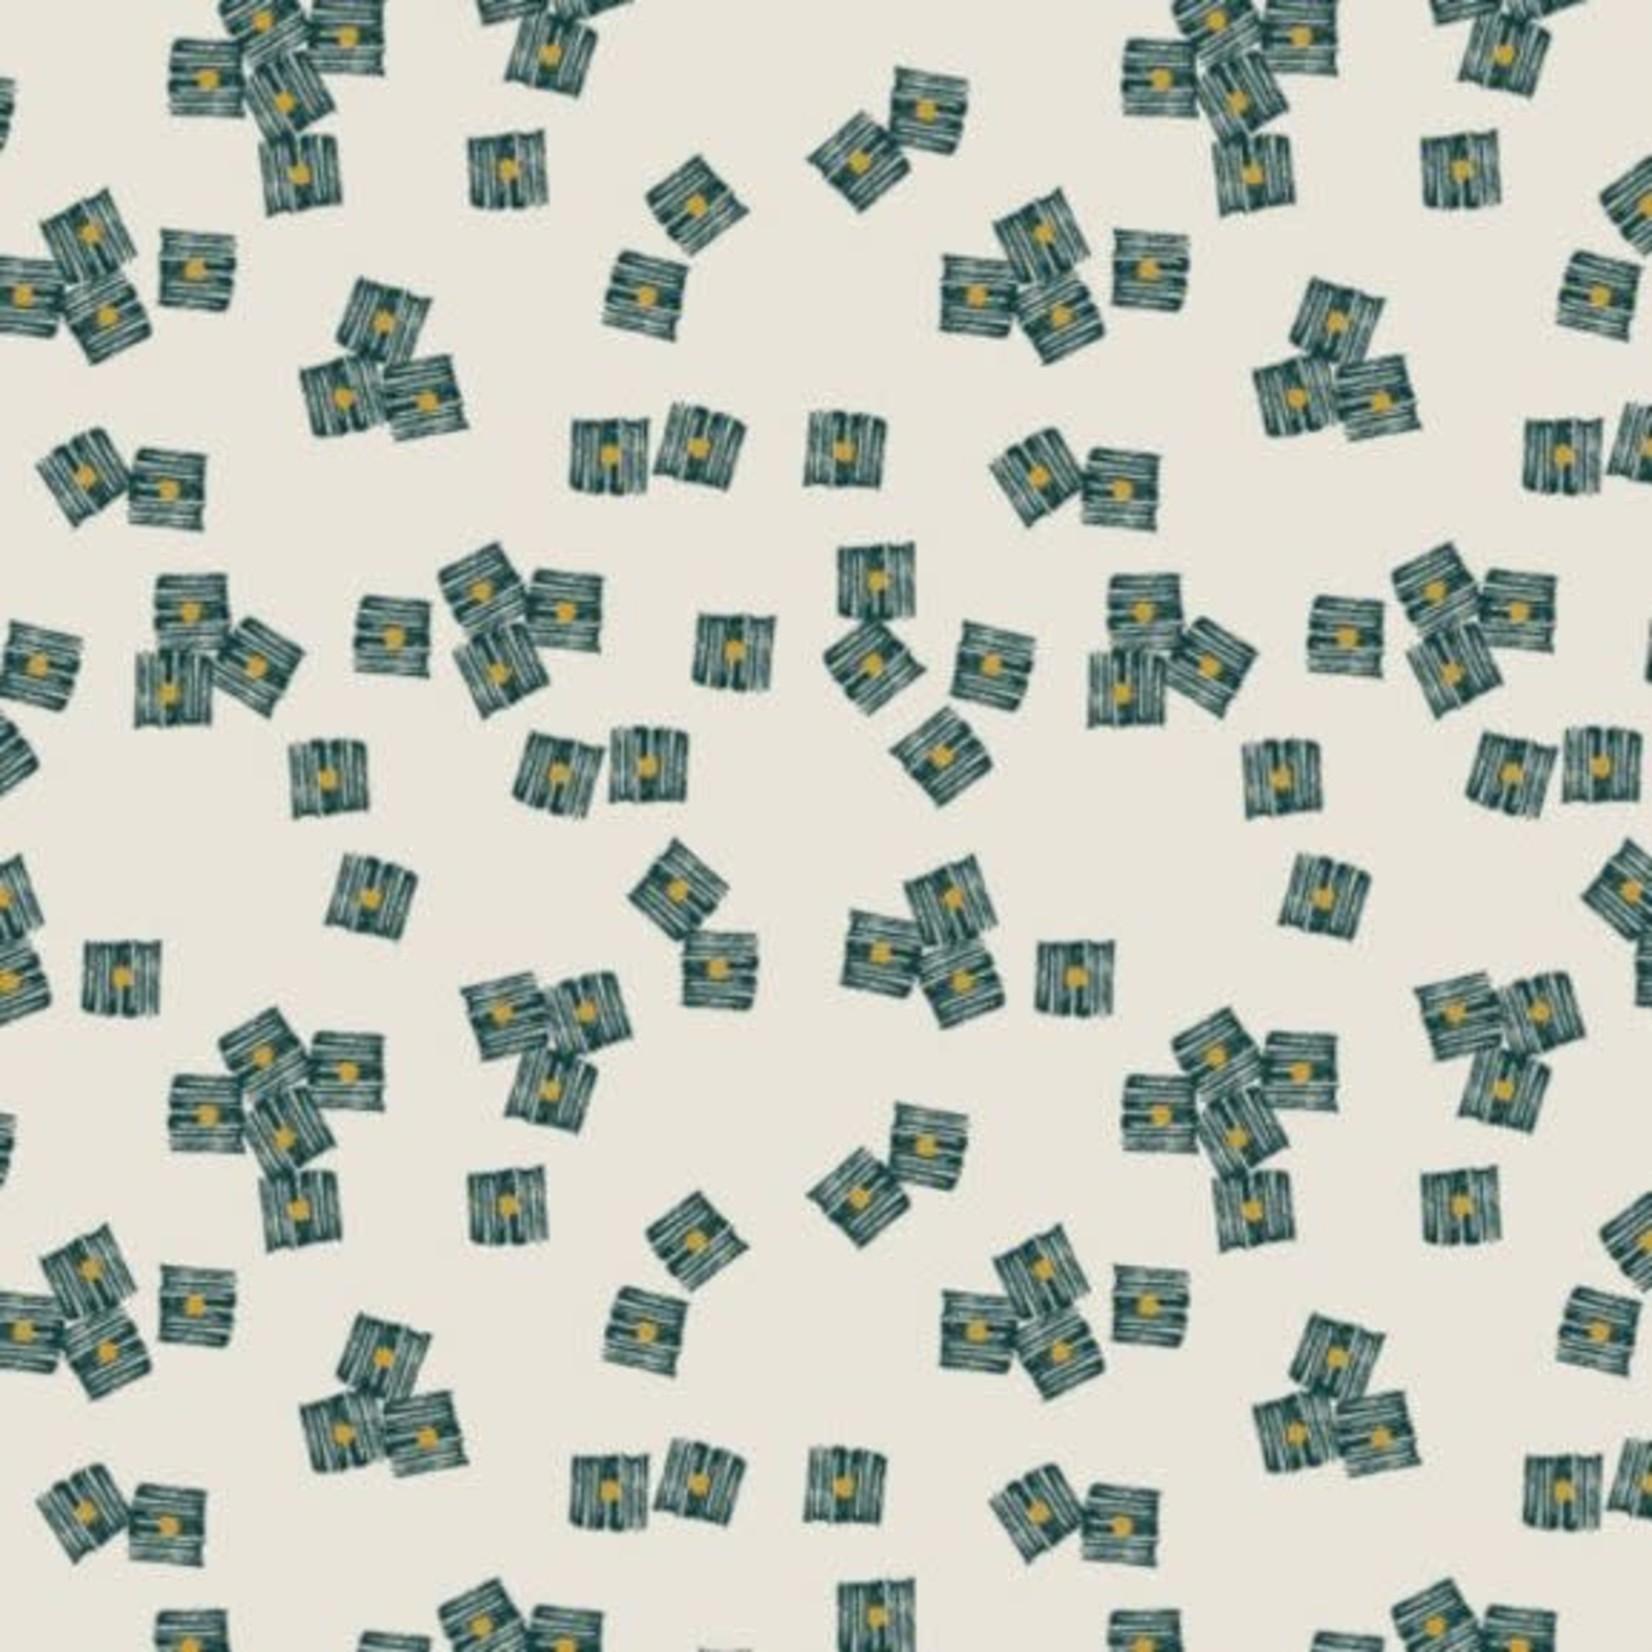 Dashwood Midnight Garden, Cubes on White LINEN/COTTON